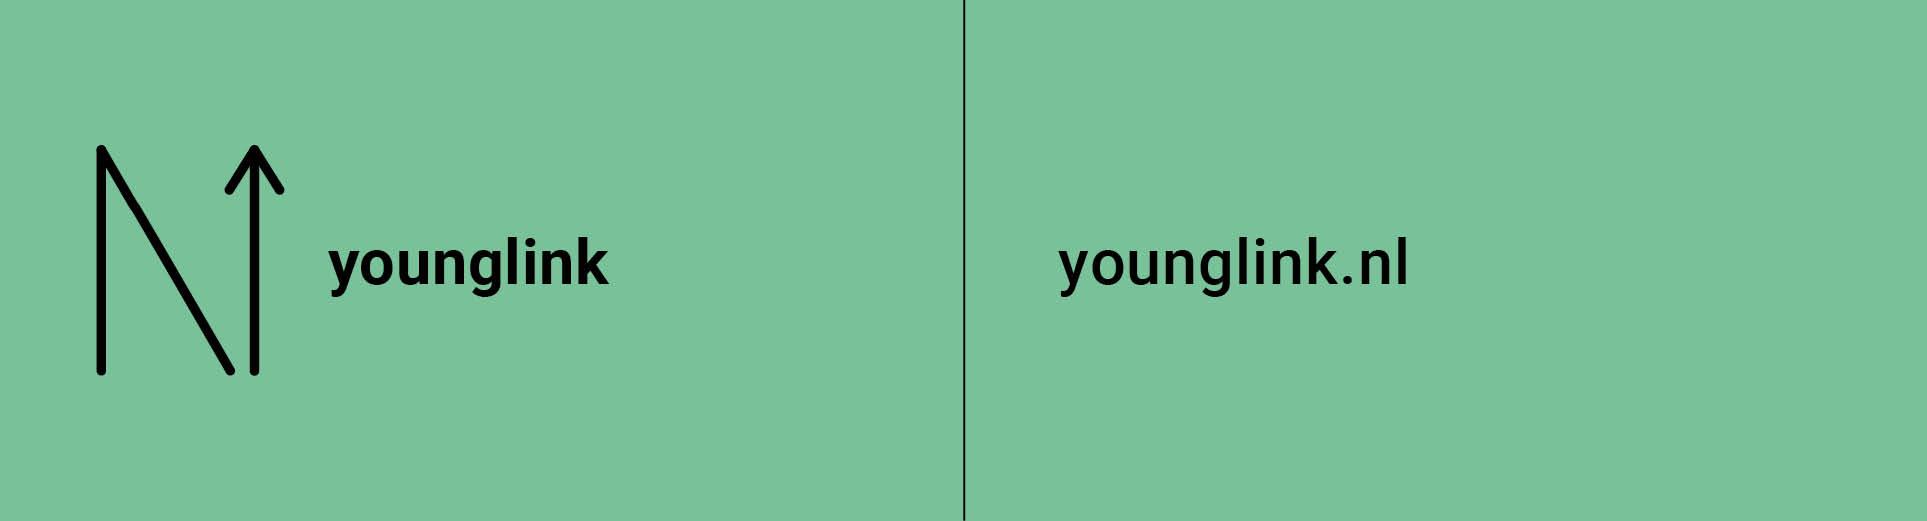 Younglink goes WalkieTalkie - maart 2021